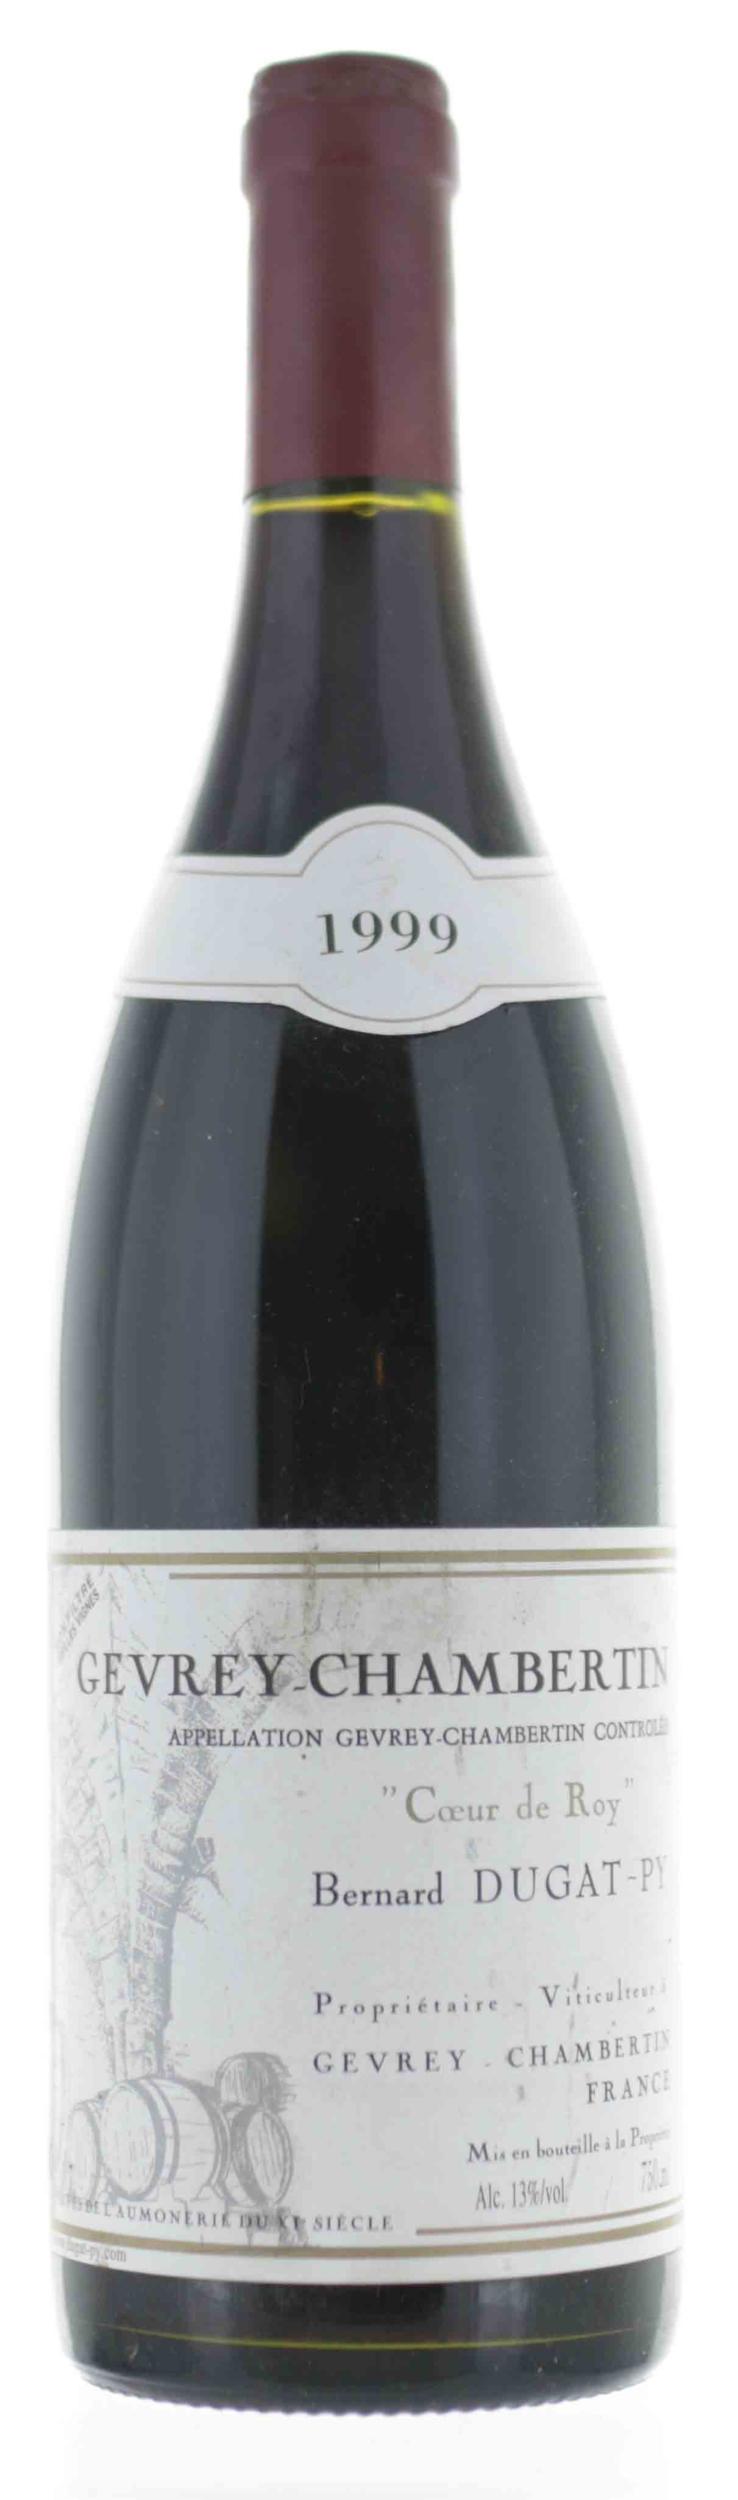 Gevrey-Chambertin - Coeur de Roy - Bernard Dugat - 1999